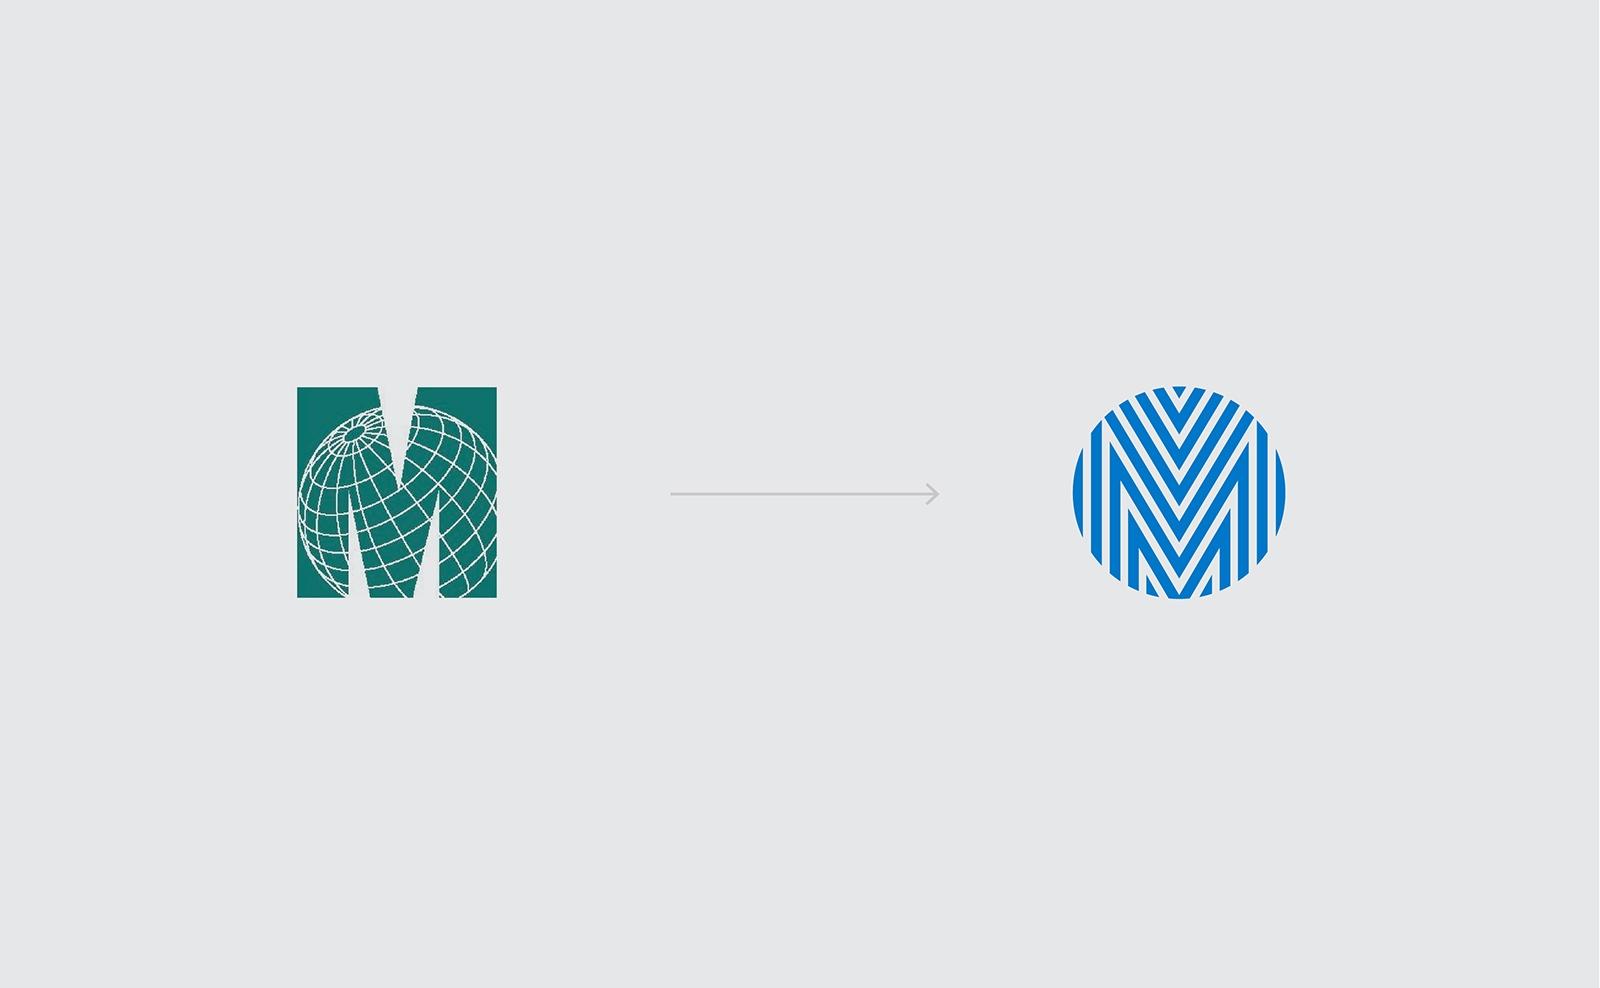 Identity Branding Design by The TOM Agency